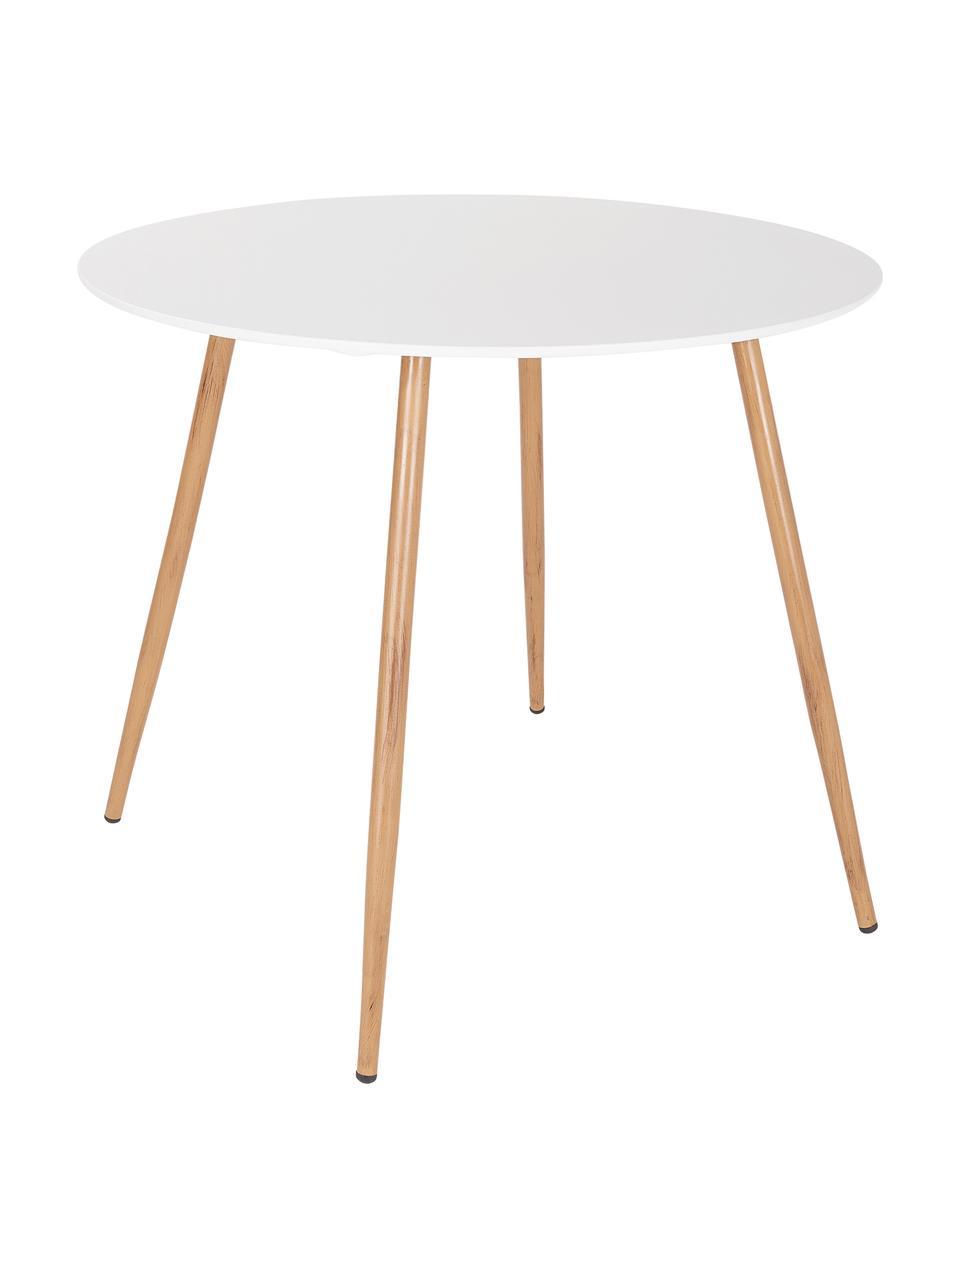 Runder Gartentisch Linea, Ø 90 cm, Tischplatte: Metall, beschichtet, Beine: Metall, beschichtet, Weiß, Hellbraun, Ø 90 cm x H 77 cm